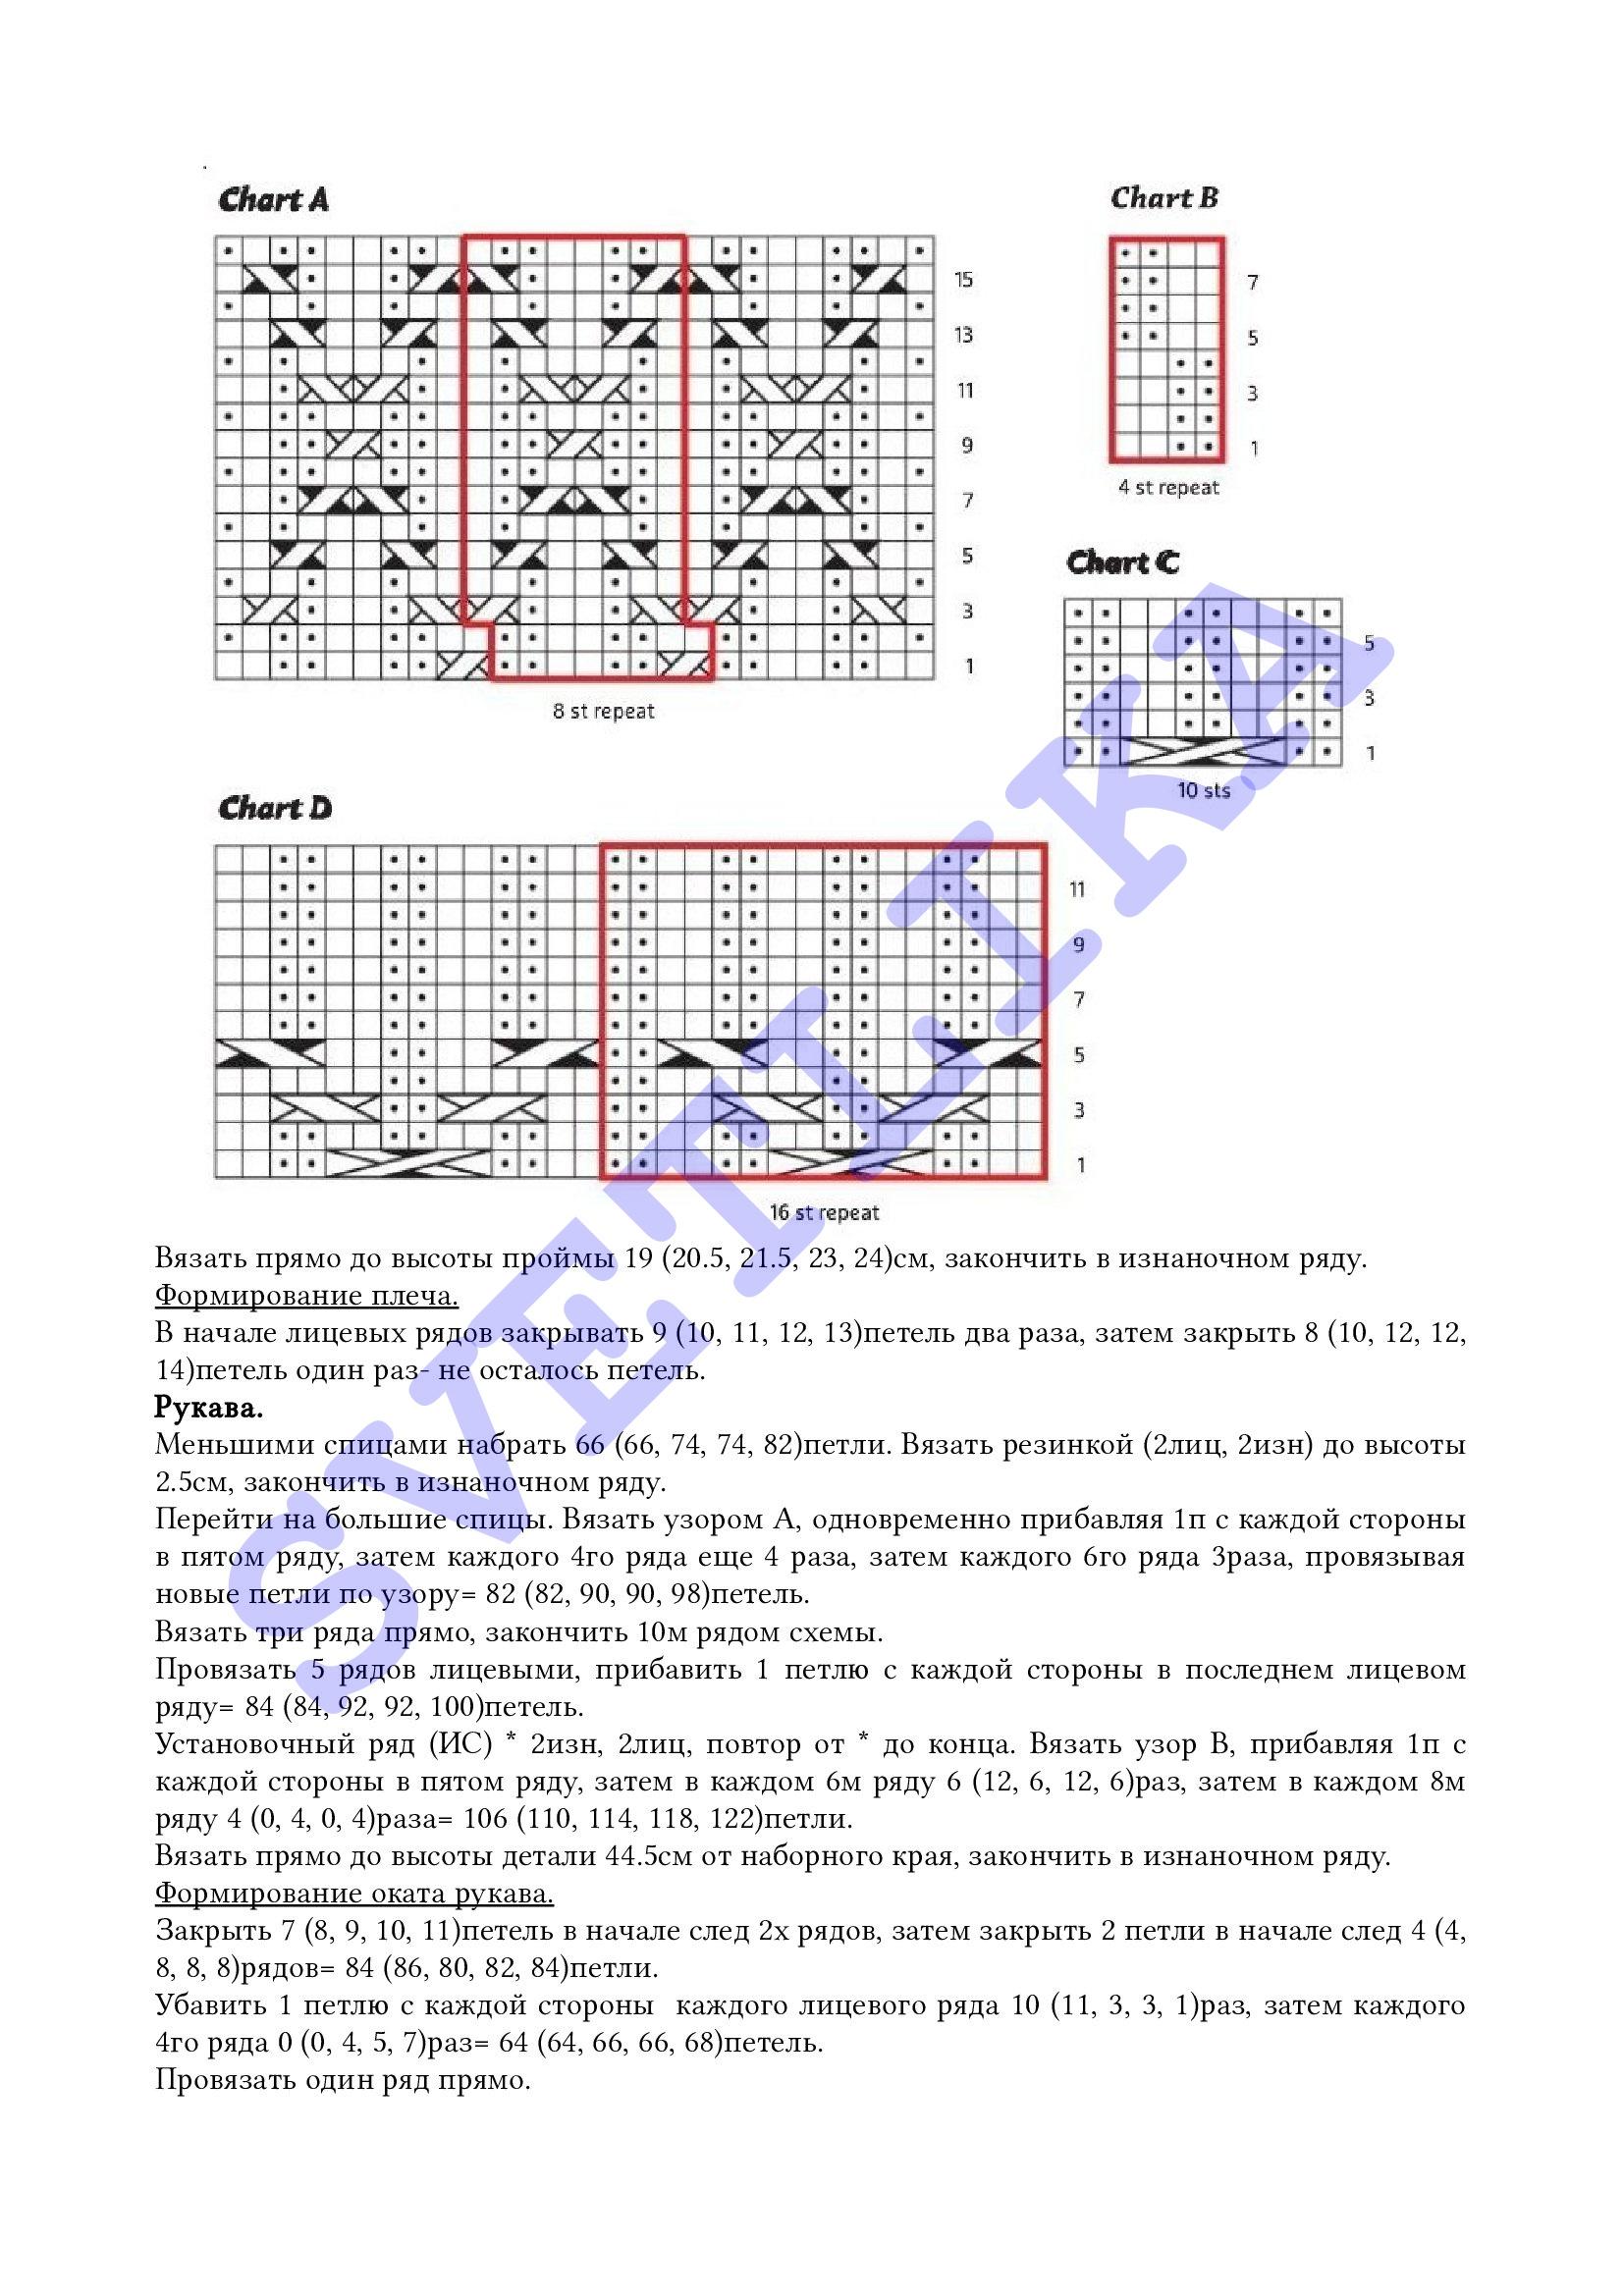 https://img-fotki.yandex.ru/get/15531/125862467.57/0_141d1e_91f19815_orig